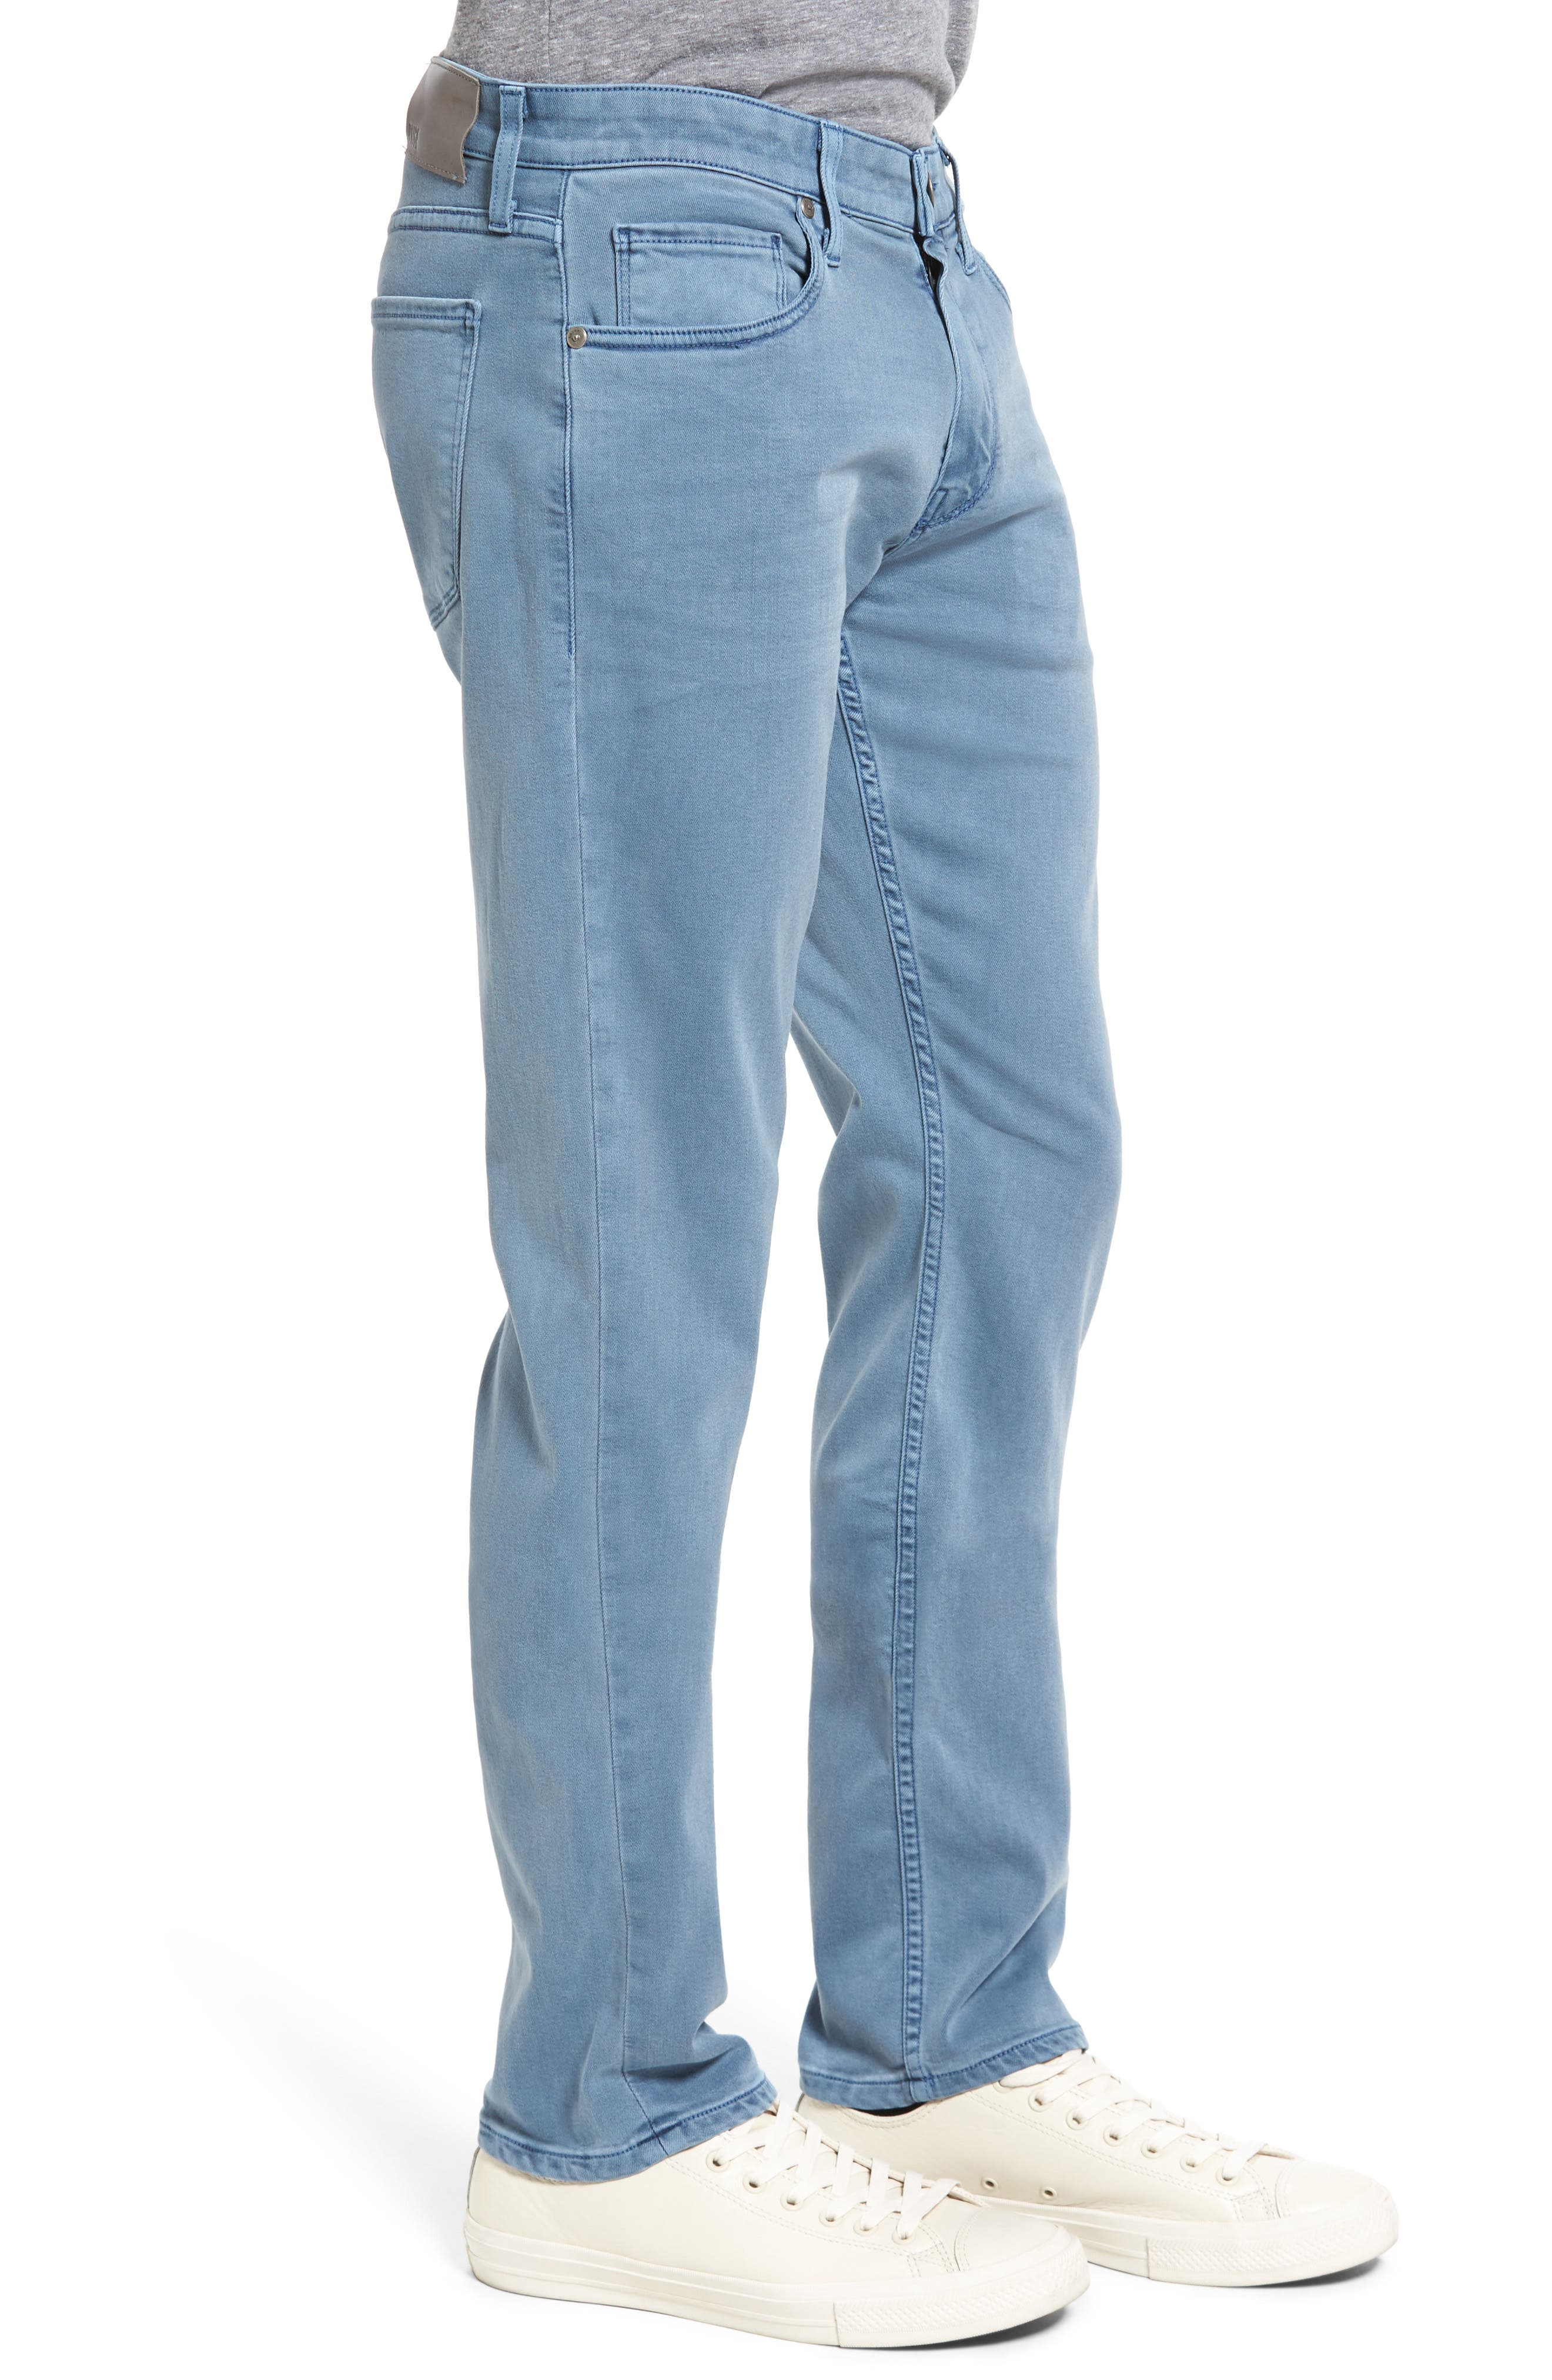 Transcend - Lennox Slim Fit Jeans,                             Alternate thumbnail 3, color,                             430